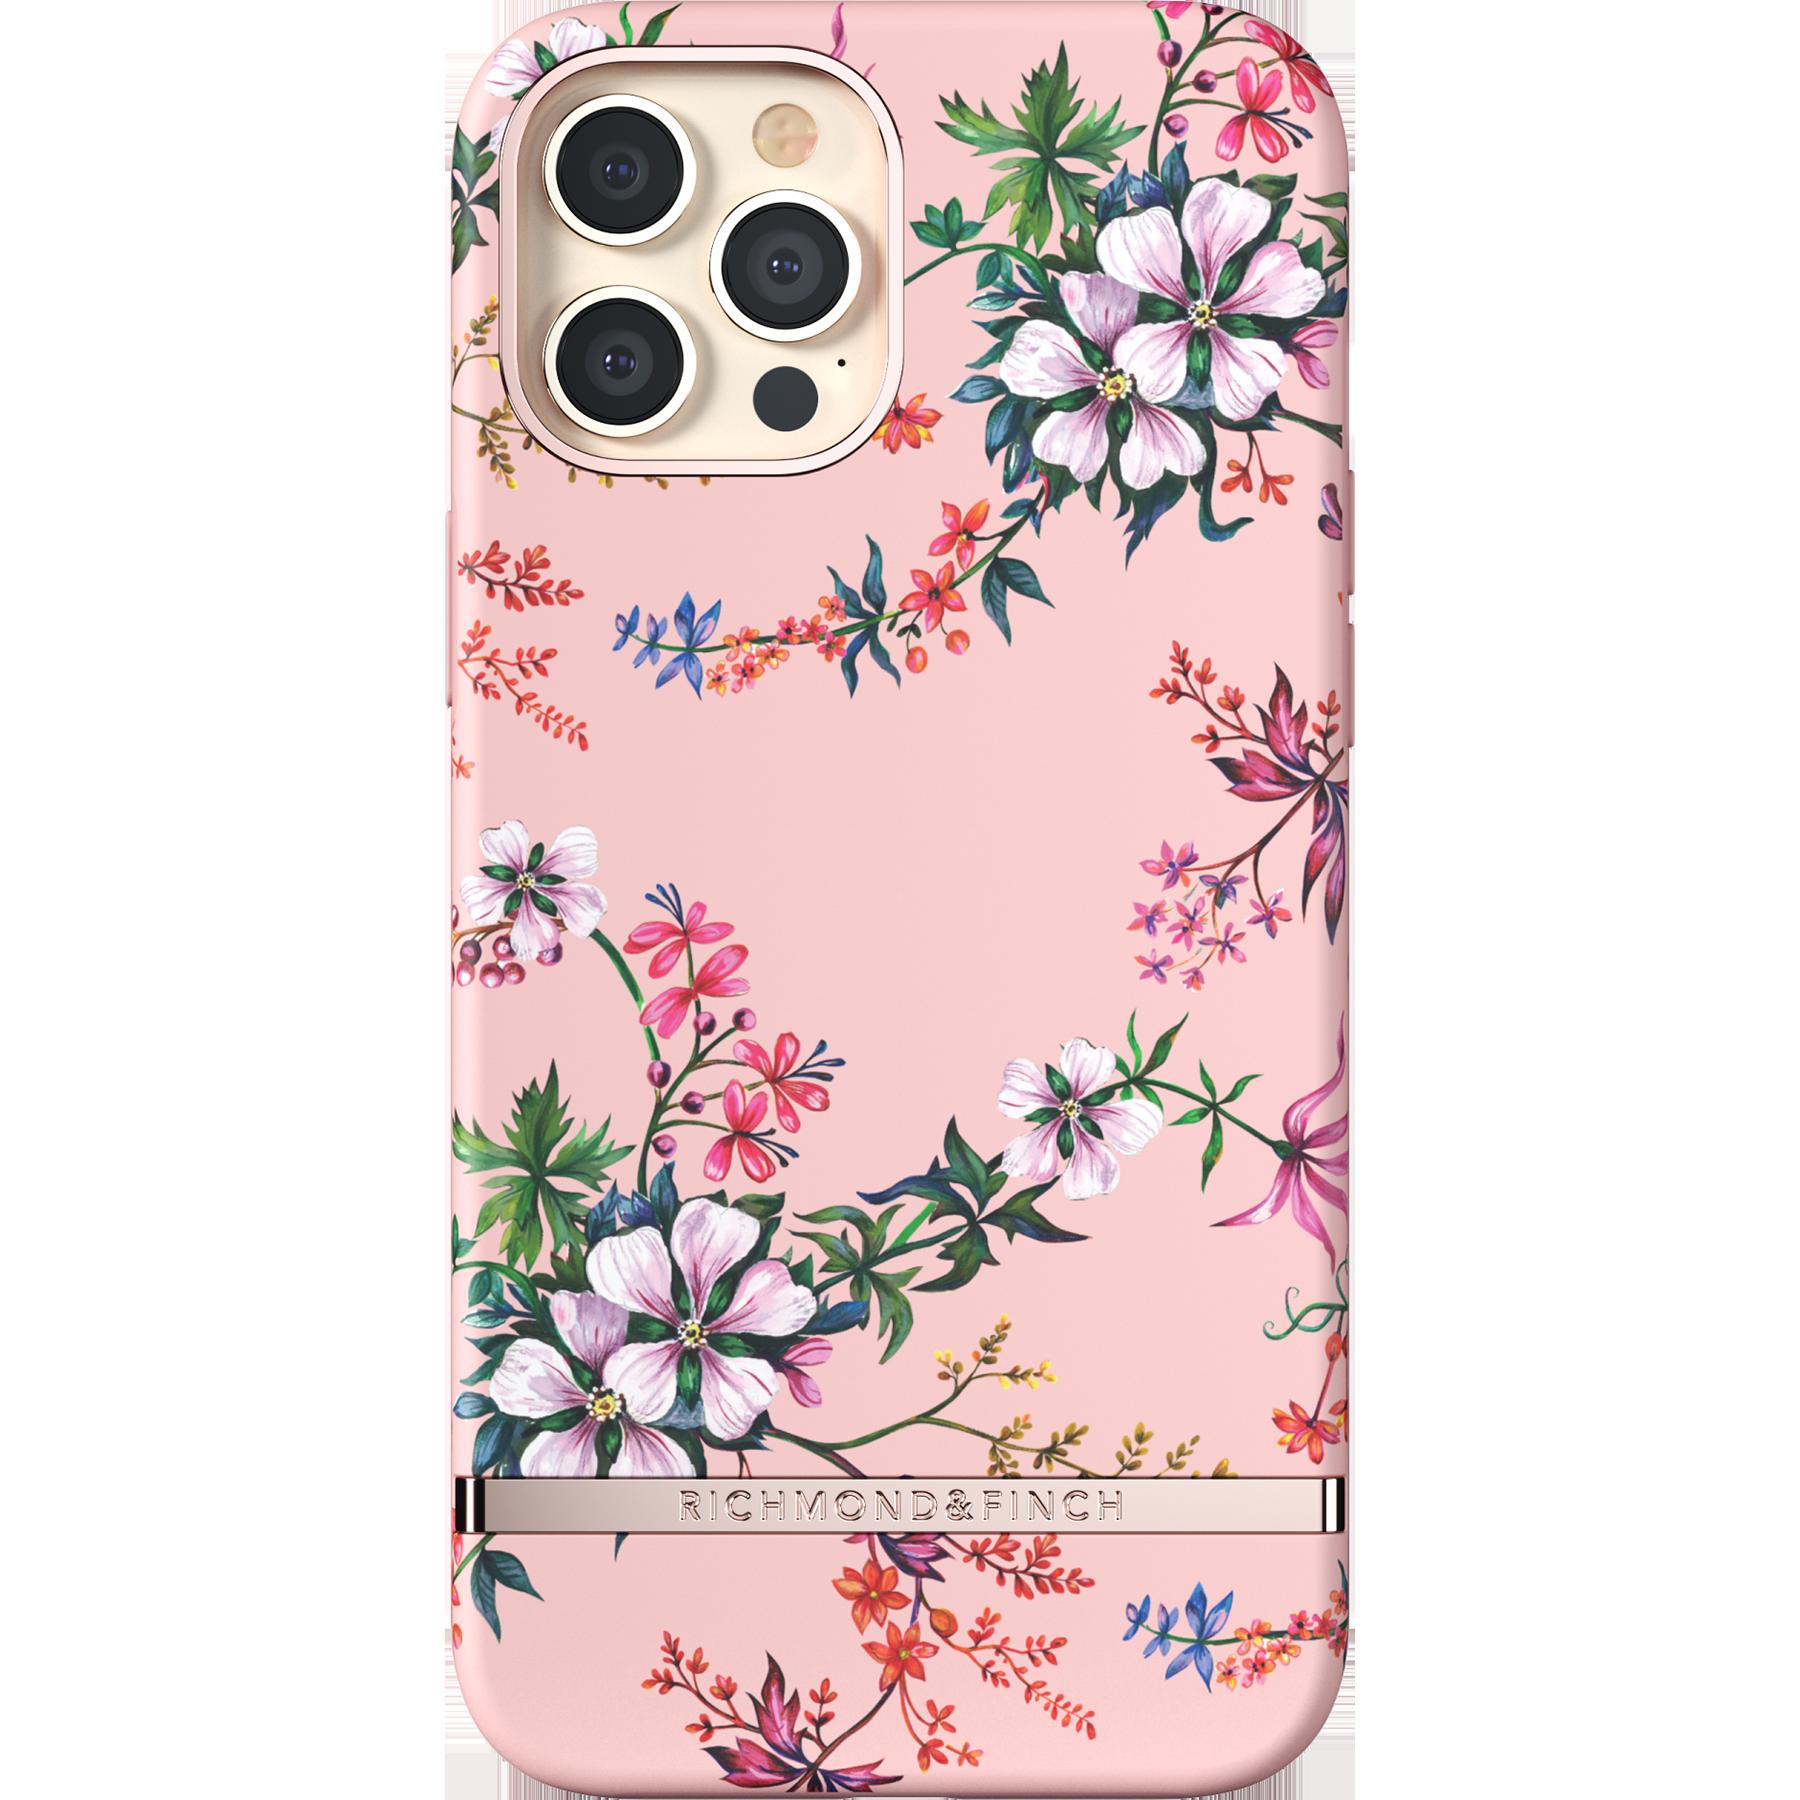 Deksel iPhone 12 Pro Max Pink Blooms